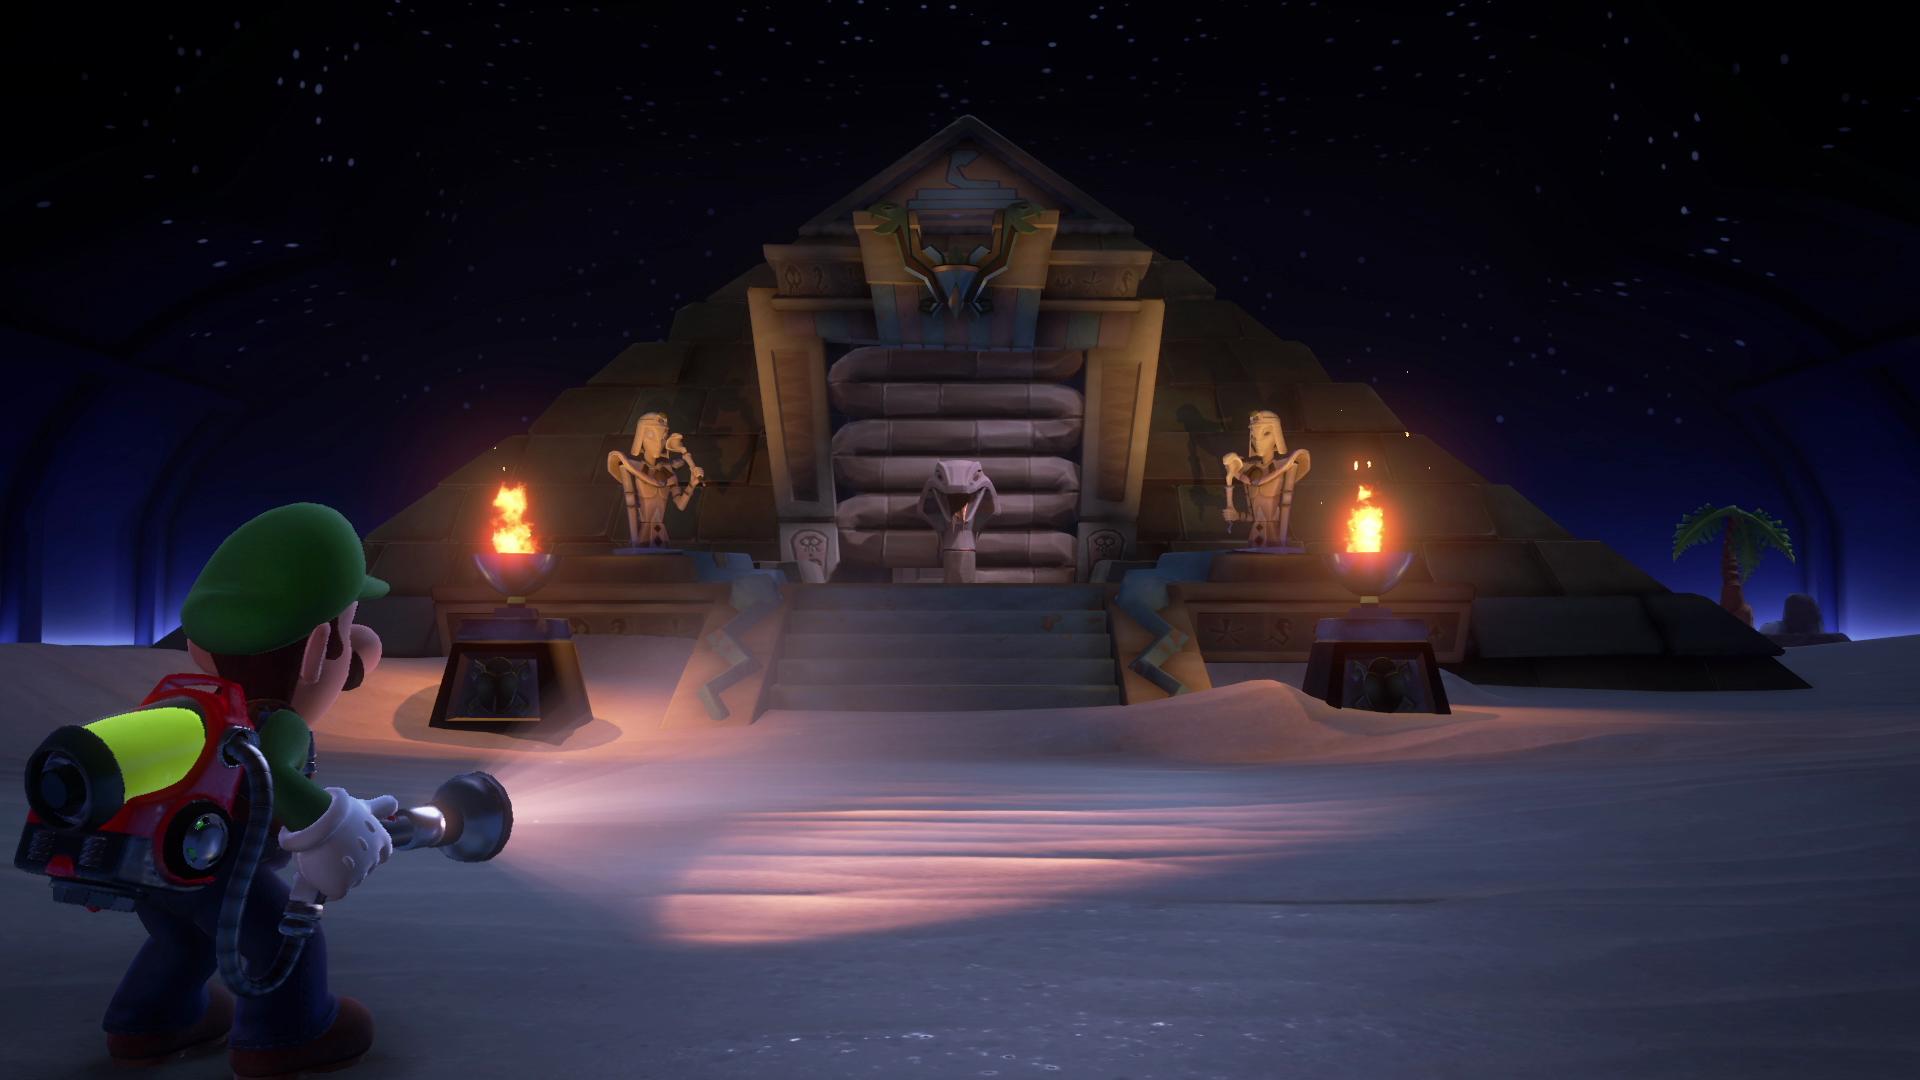 Luigi S Mansion 3 Has Been Updated To Version 1 2 1 My